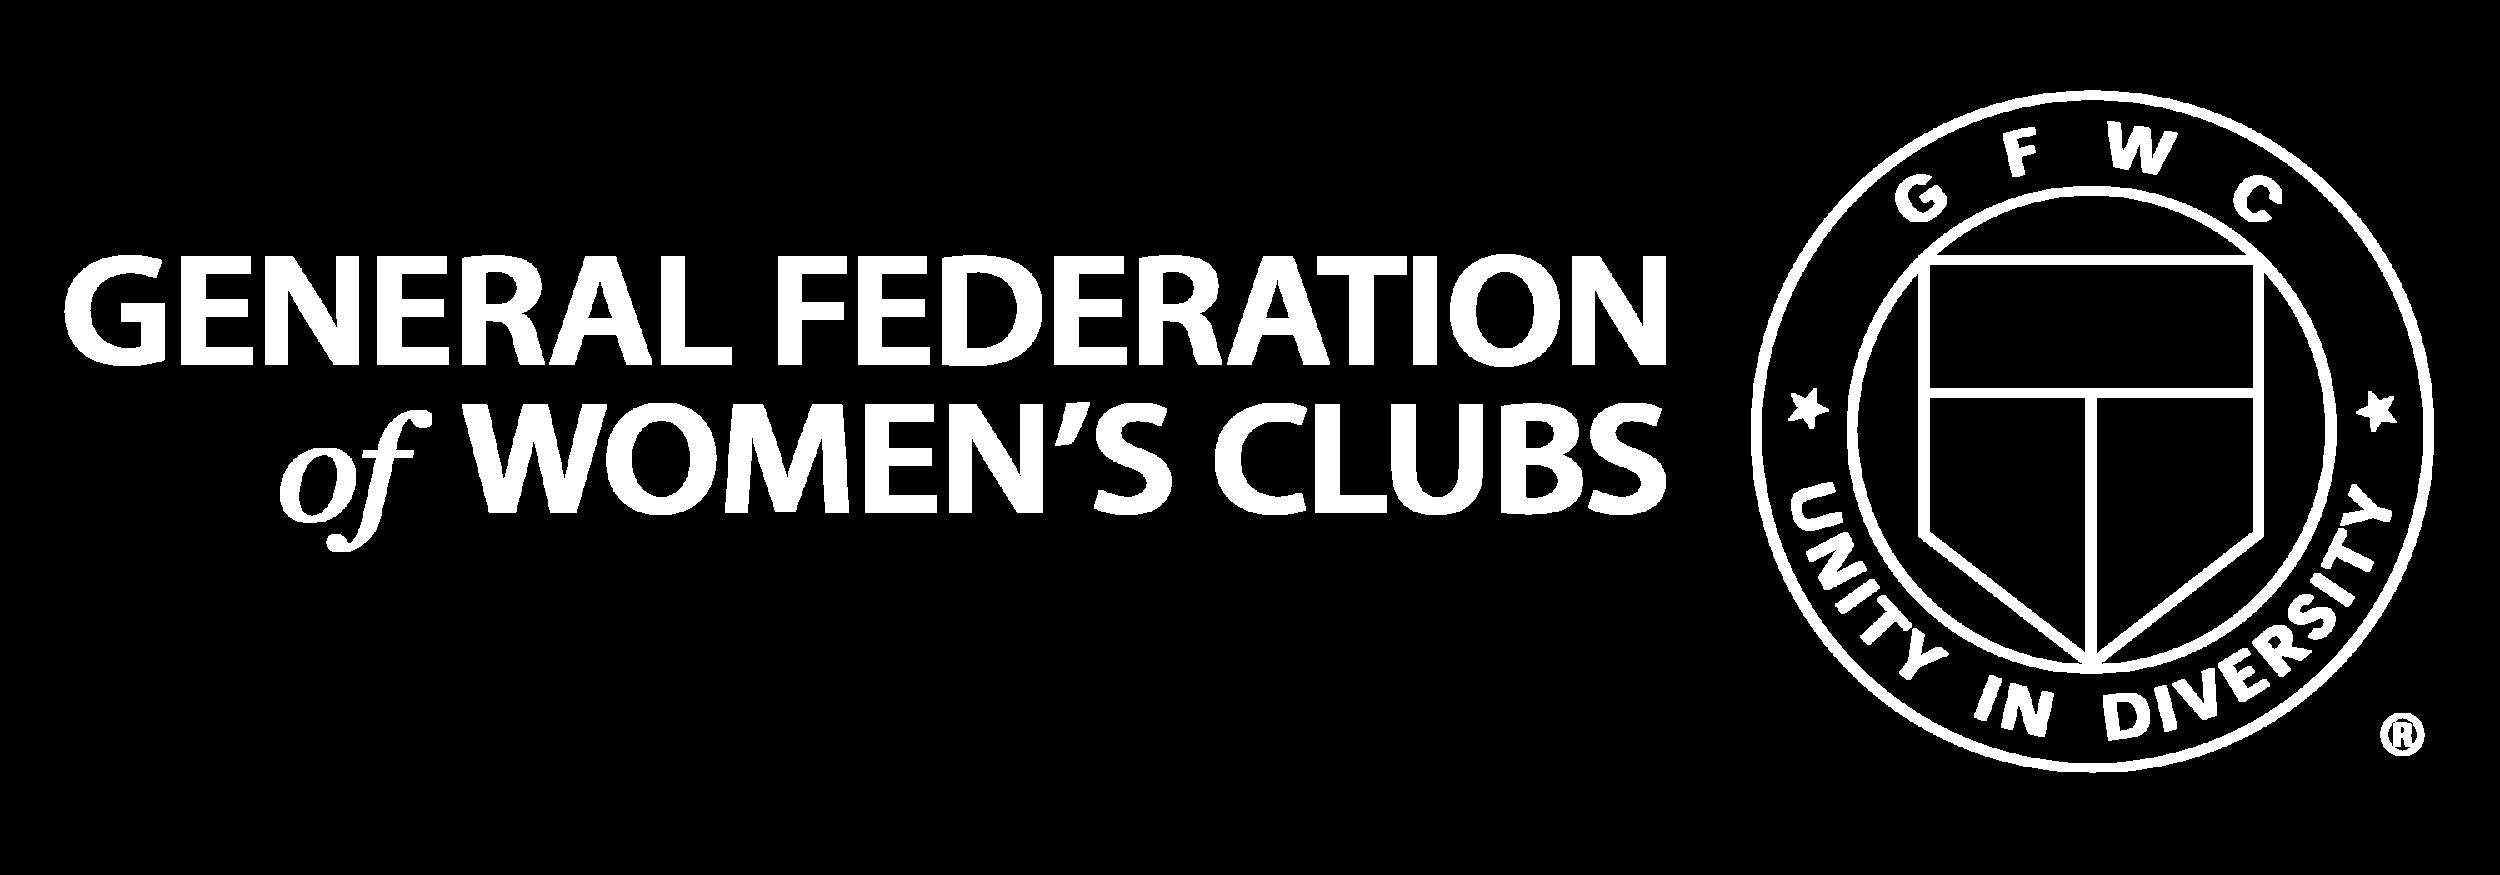 GFWC_Logo_W_horz_r.png